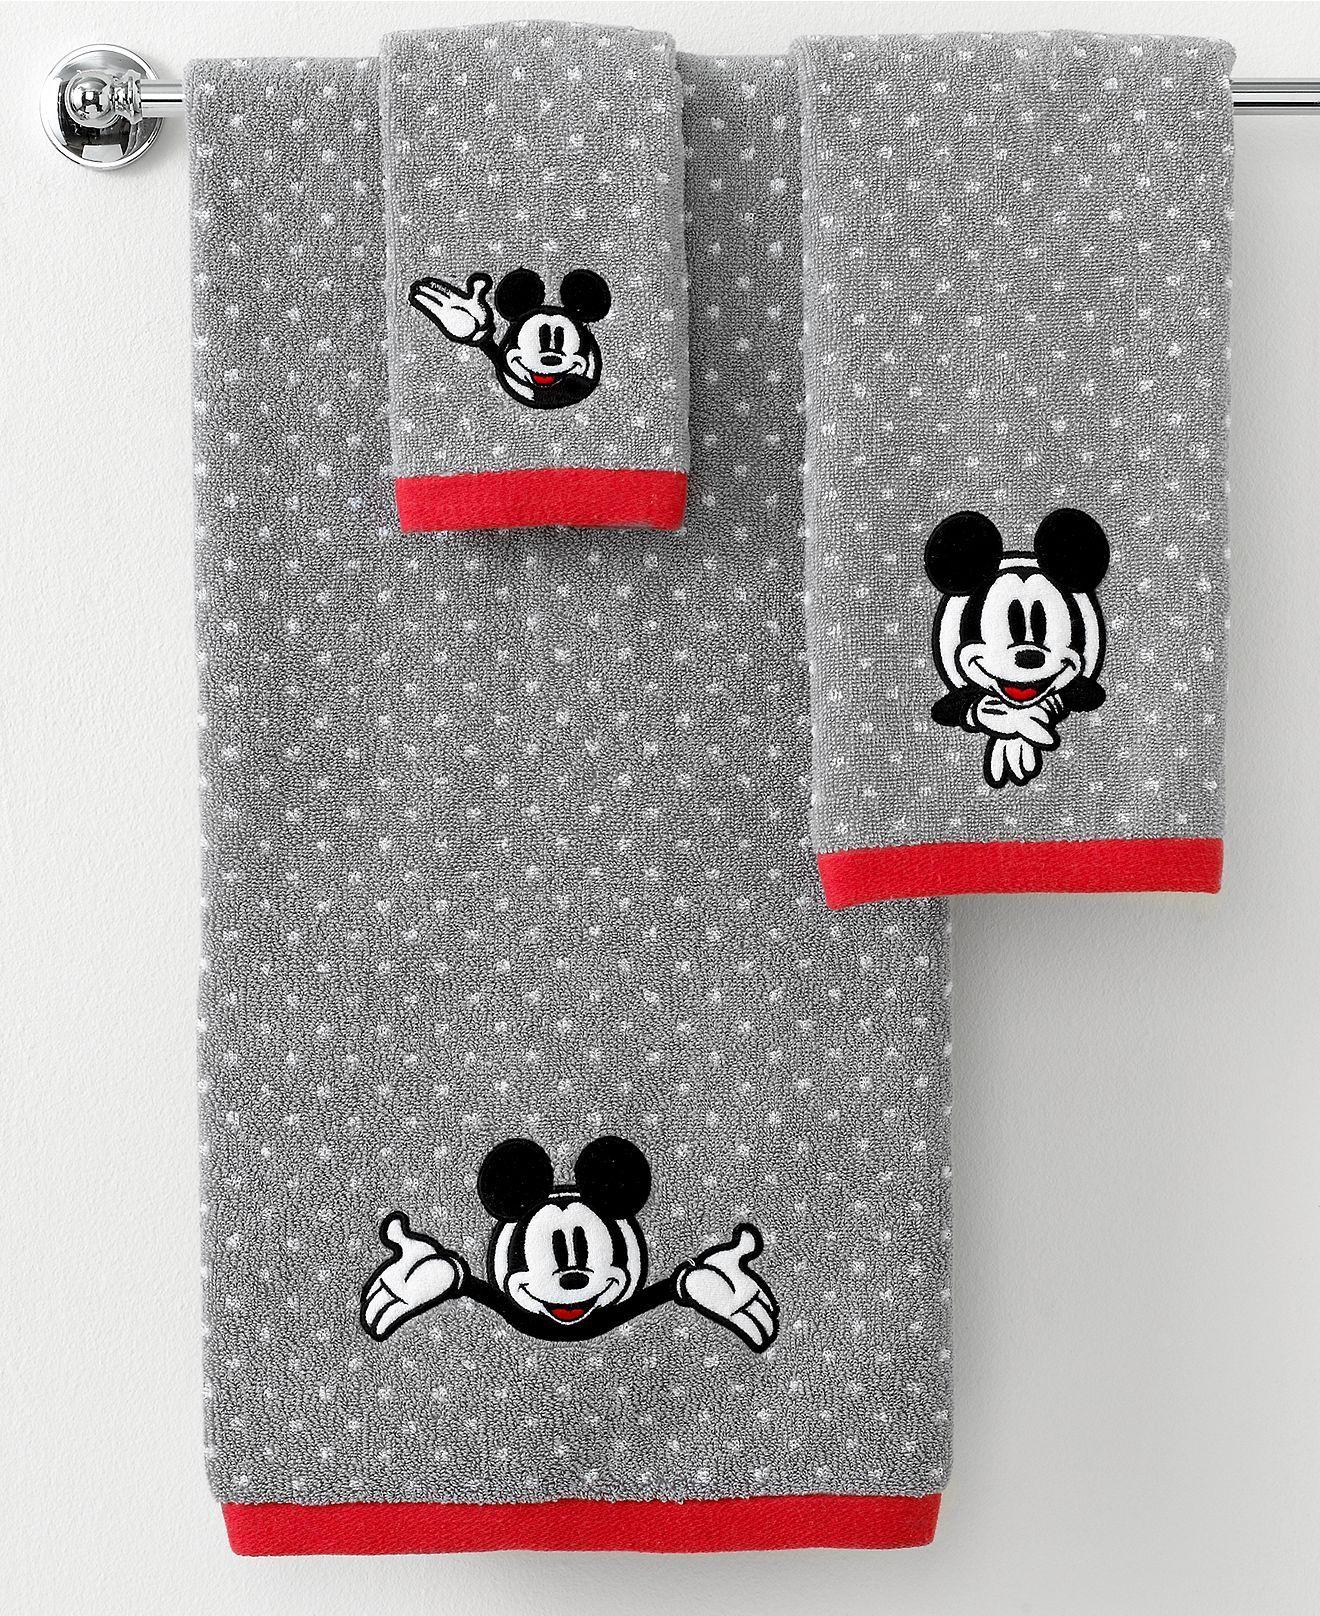 Disney Bath Towels, Disney Mickey Mouse Collection   Bath Towels   Bed Bath    Macyu0027s